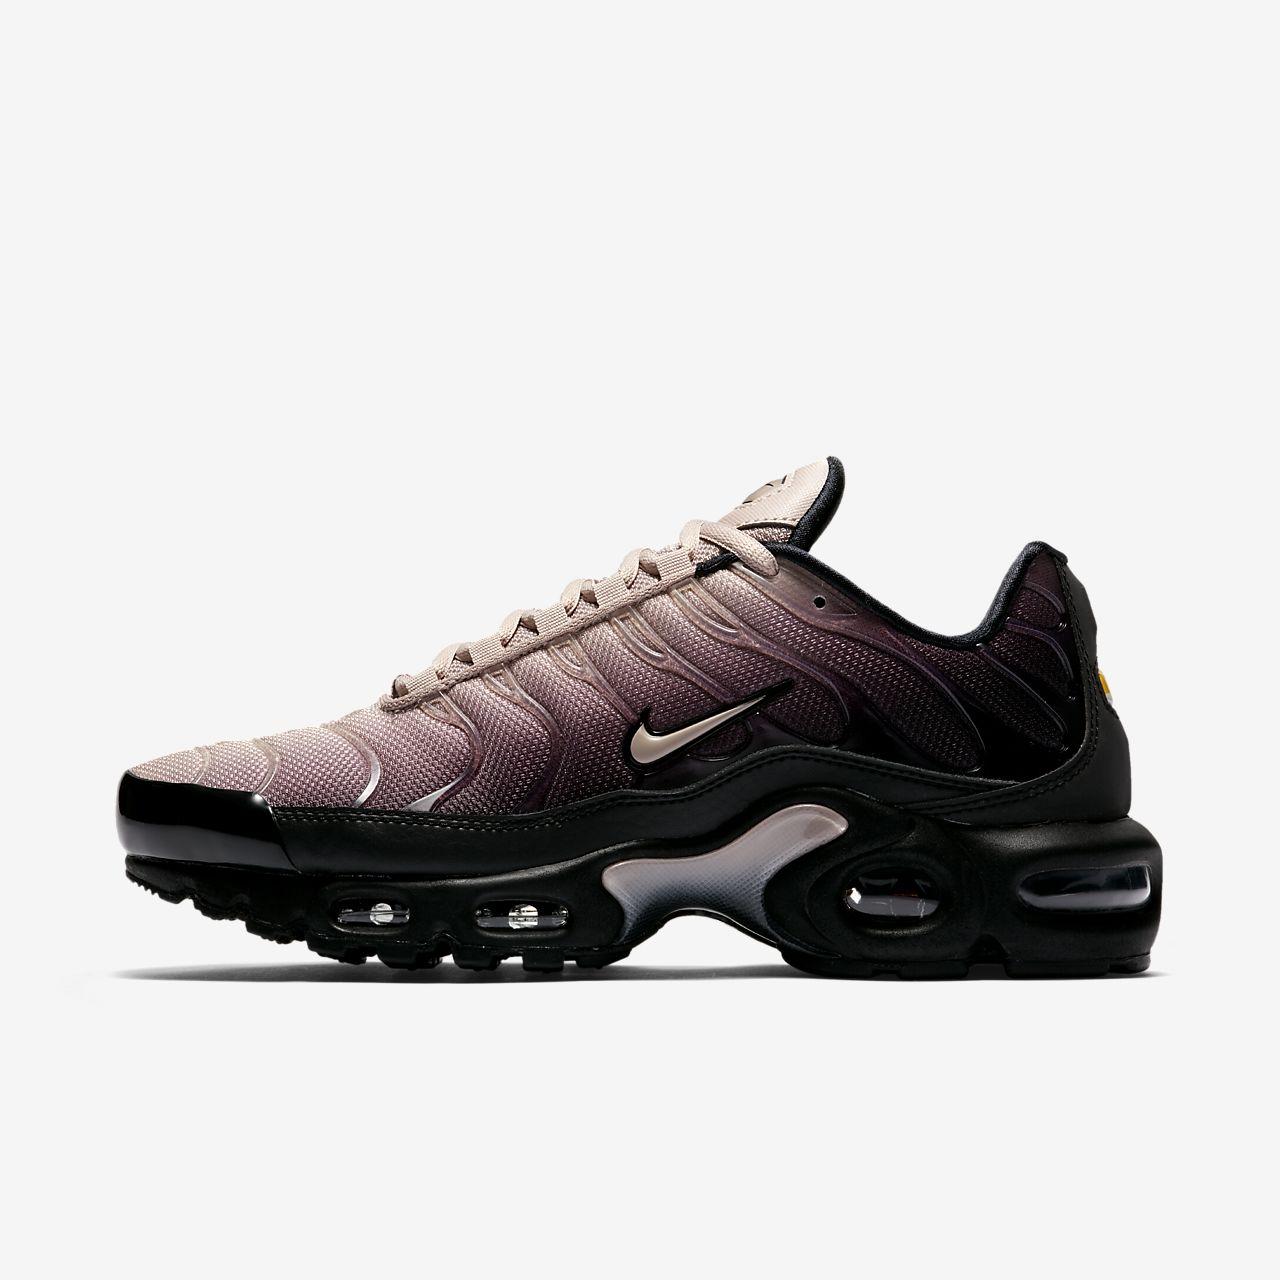 Chaussure Nike Air Max Plus TN SE pour Femme